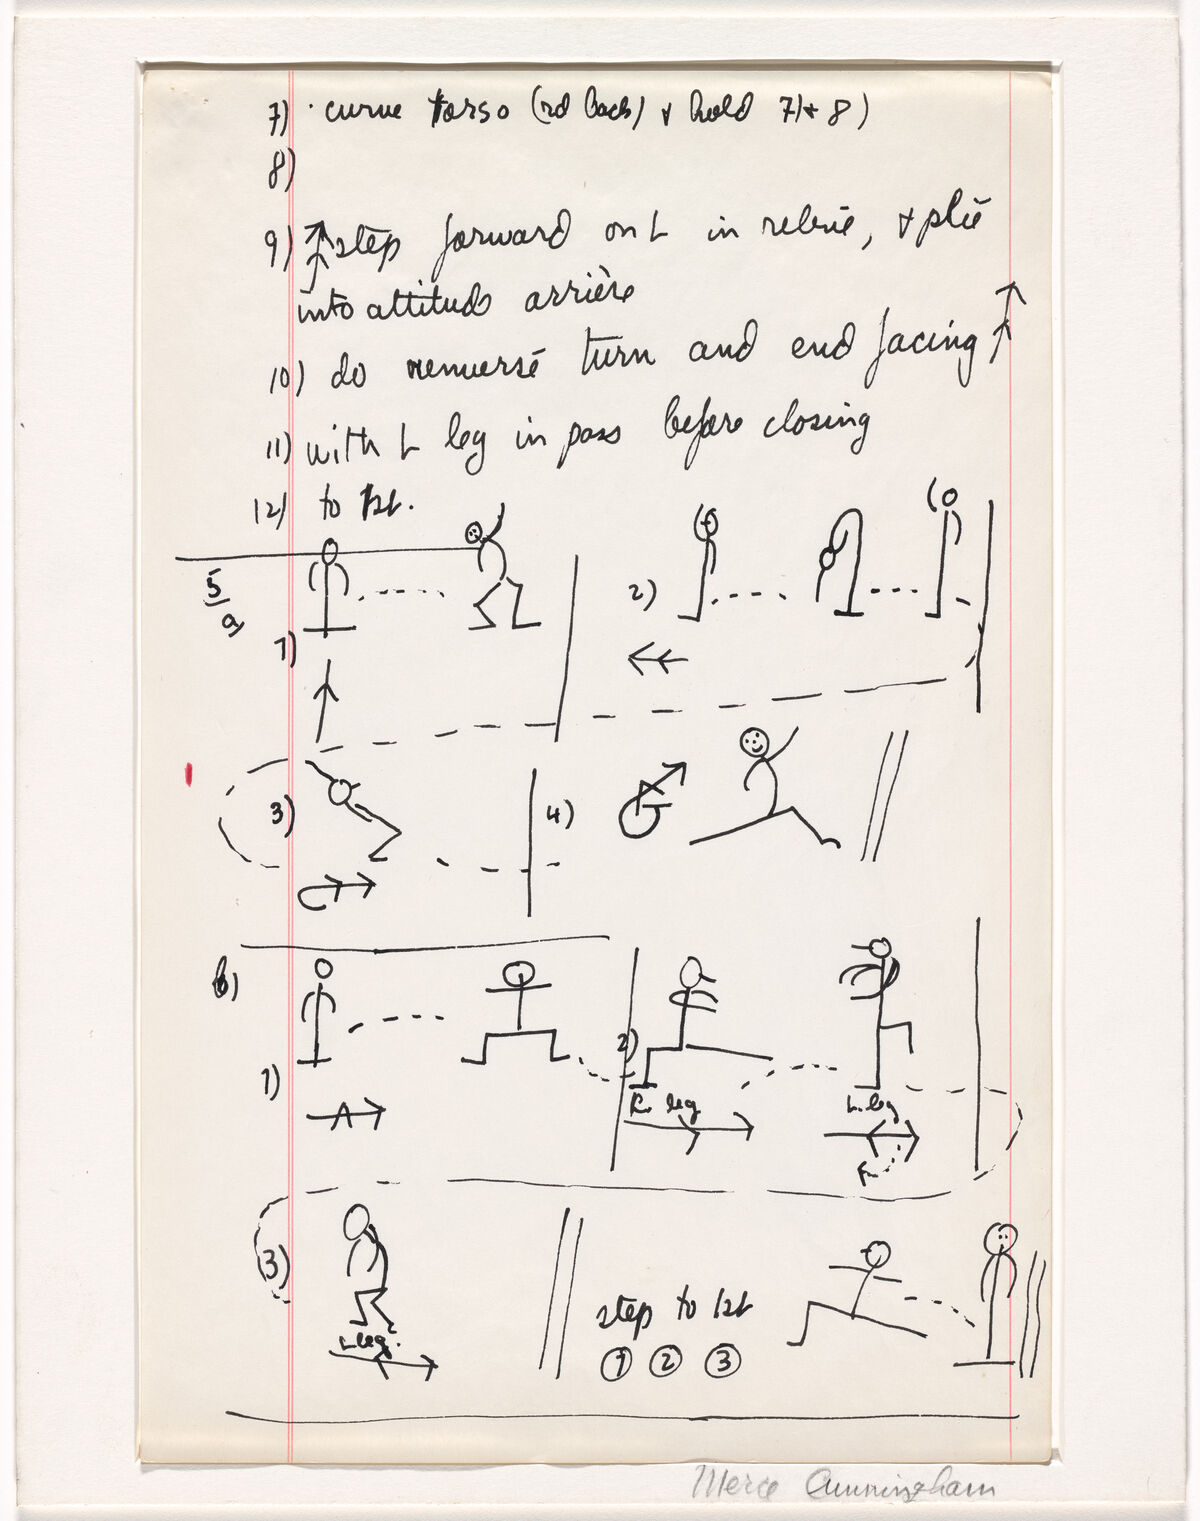 Merce Cunningham.  Aeon (.a).   1961/63. © 2019 Merce Cunningham. Courtesy of the Museum of Modern Art.